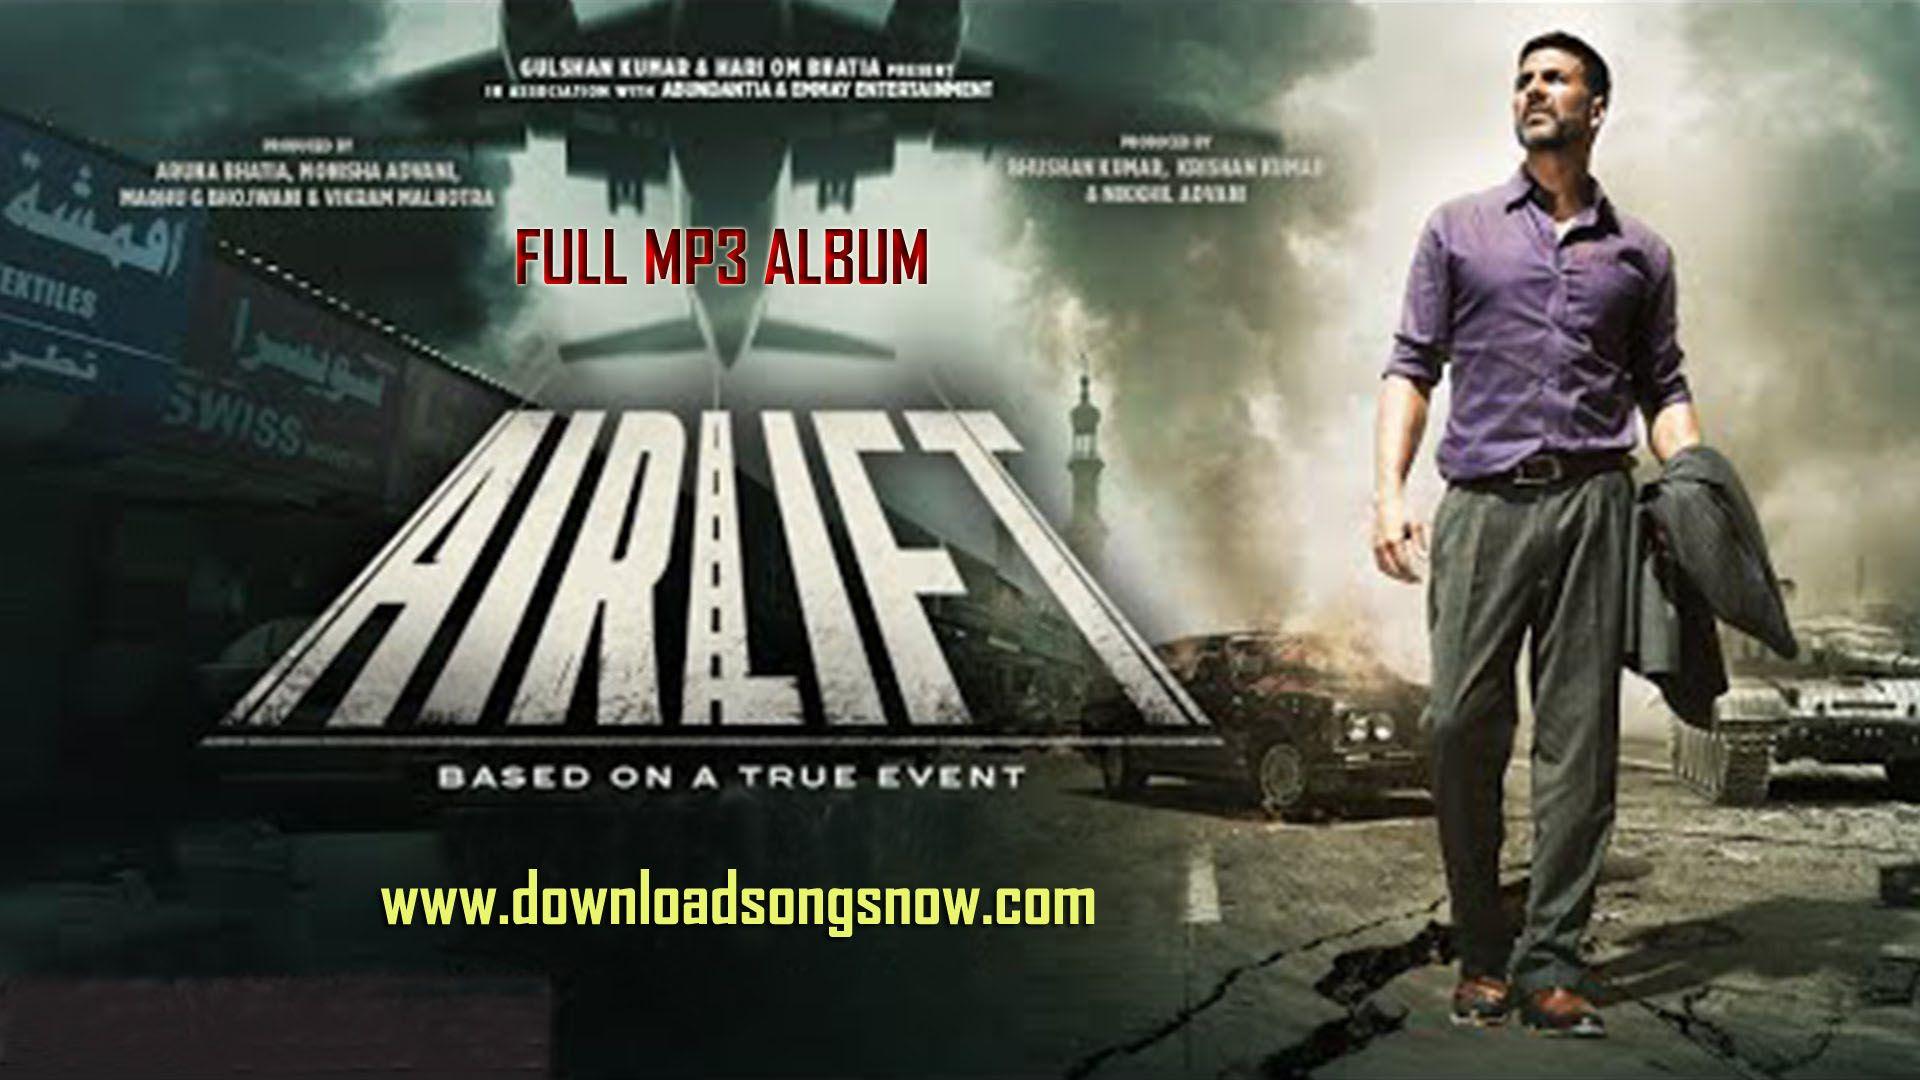 Magic Mamoni - Neha Kakkar - Agnee 2 Bengali Movie (FREE DOWNLOAD MP3 SONG)